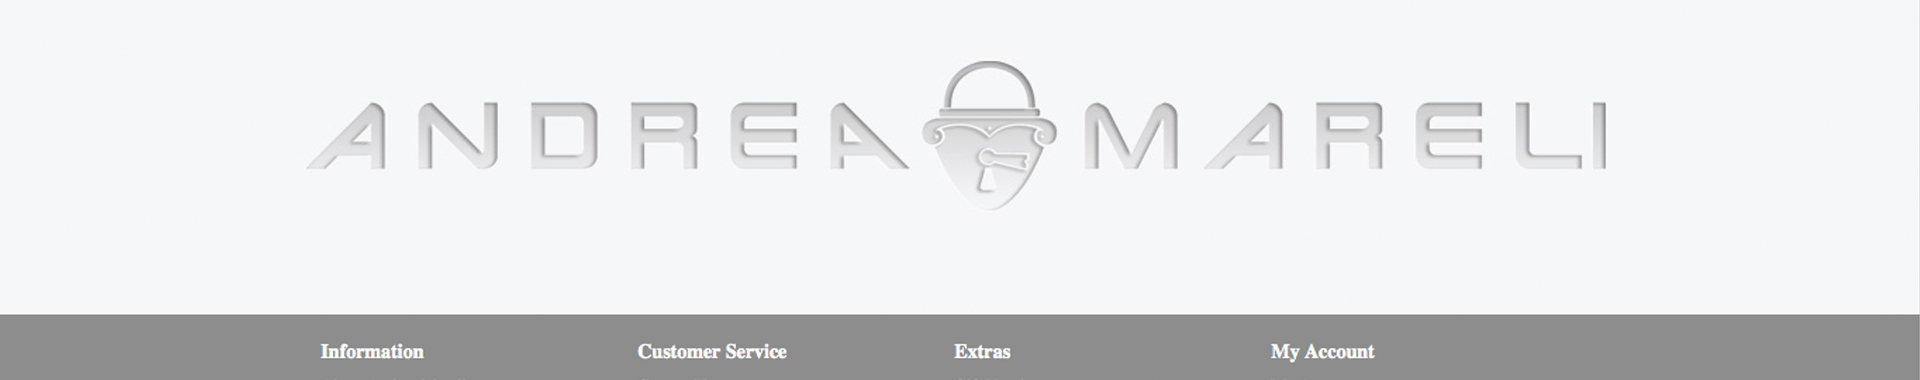 eCommerce CMS Websites